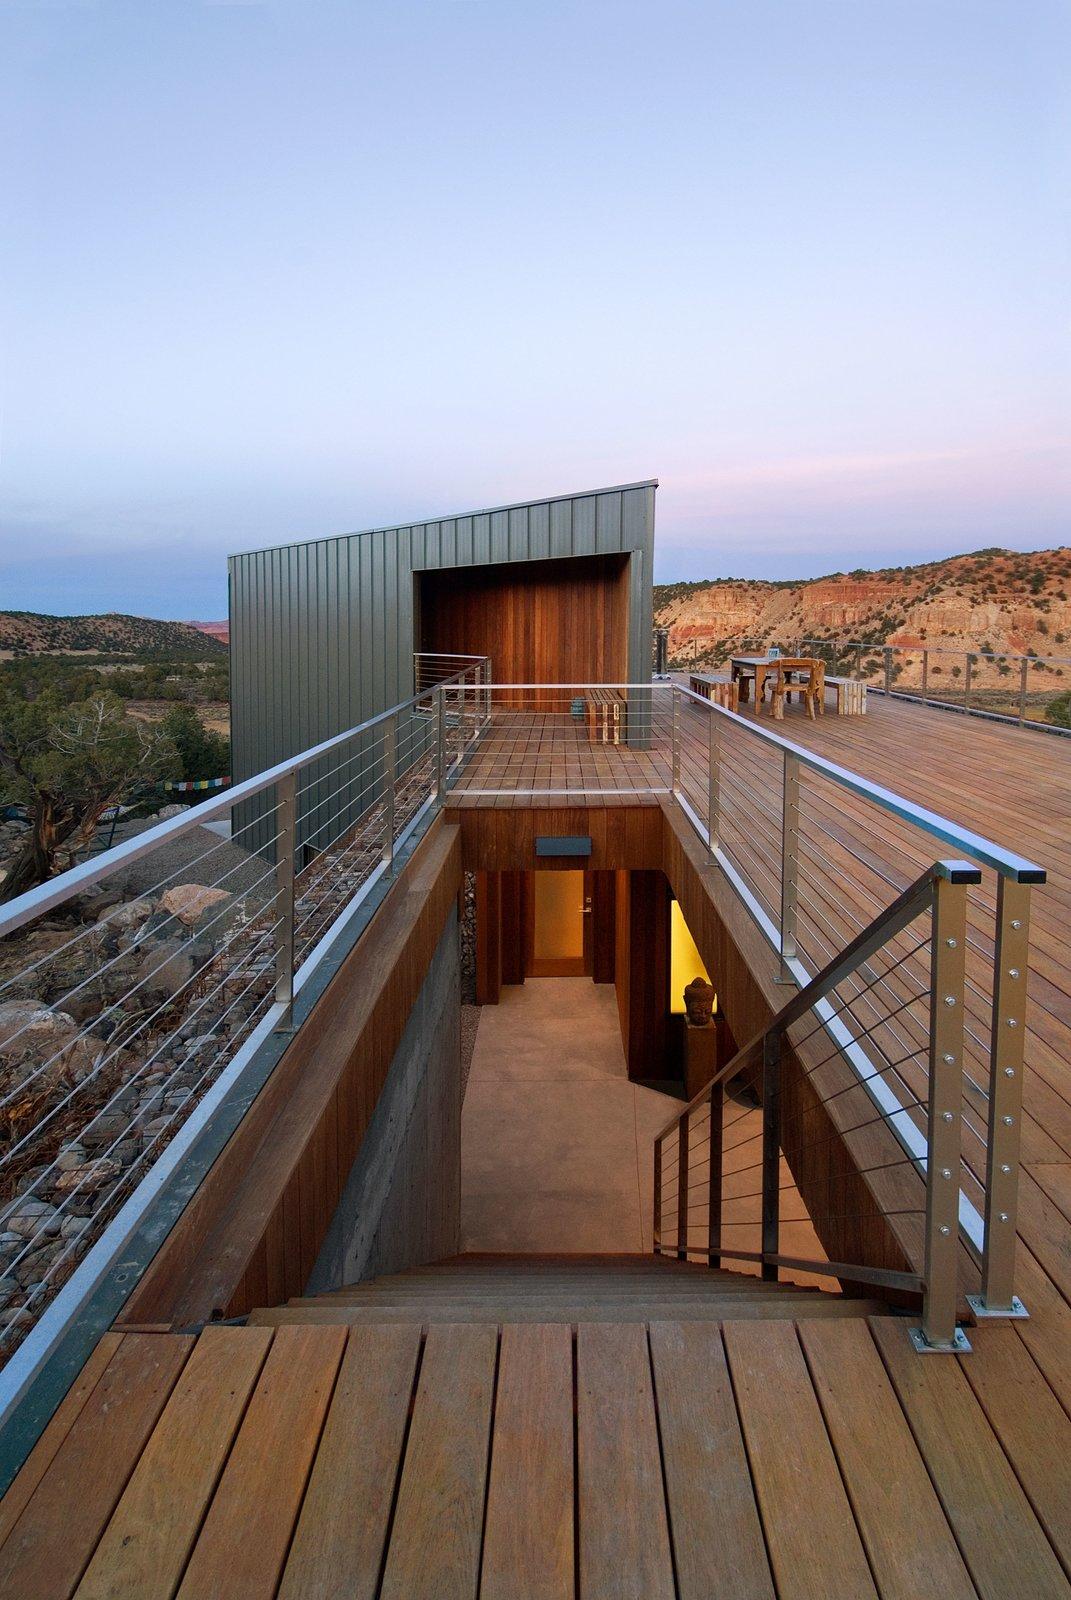 Buddhist Retreat by Imbue Design